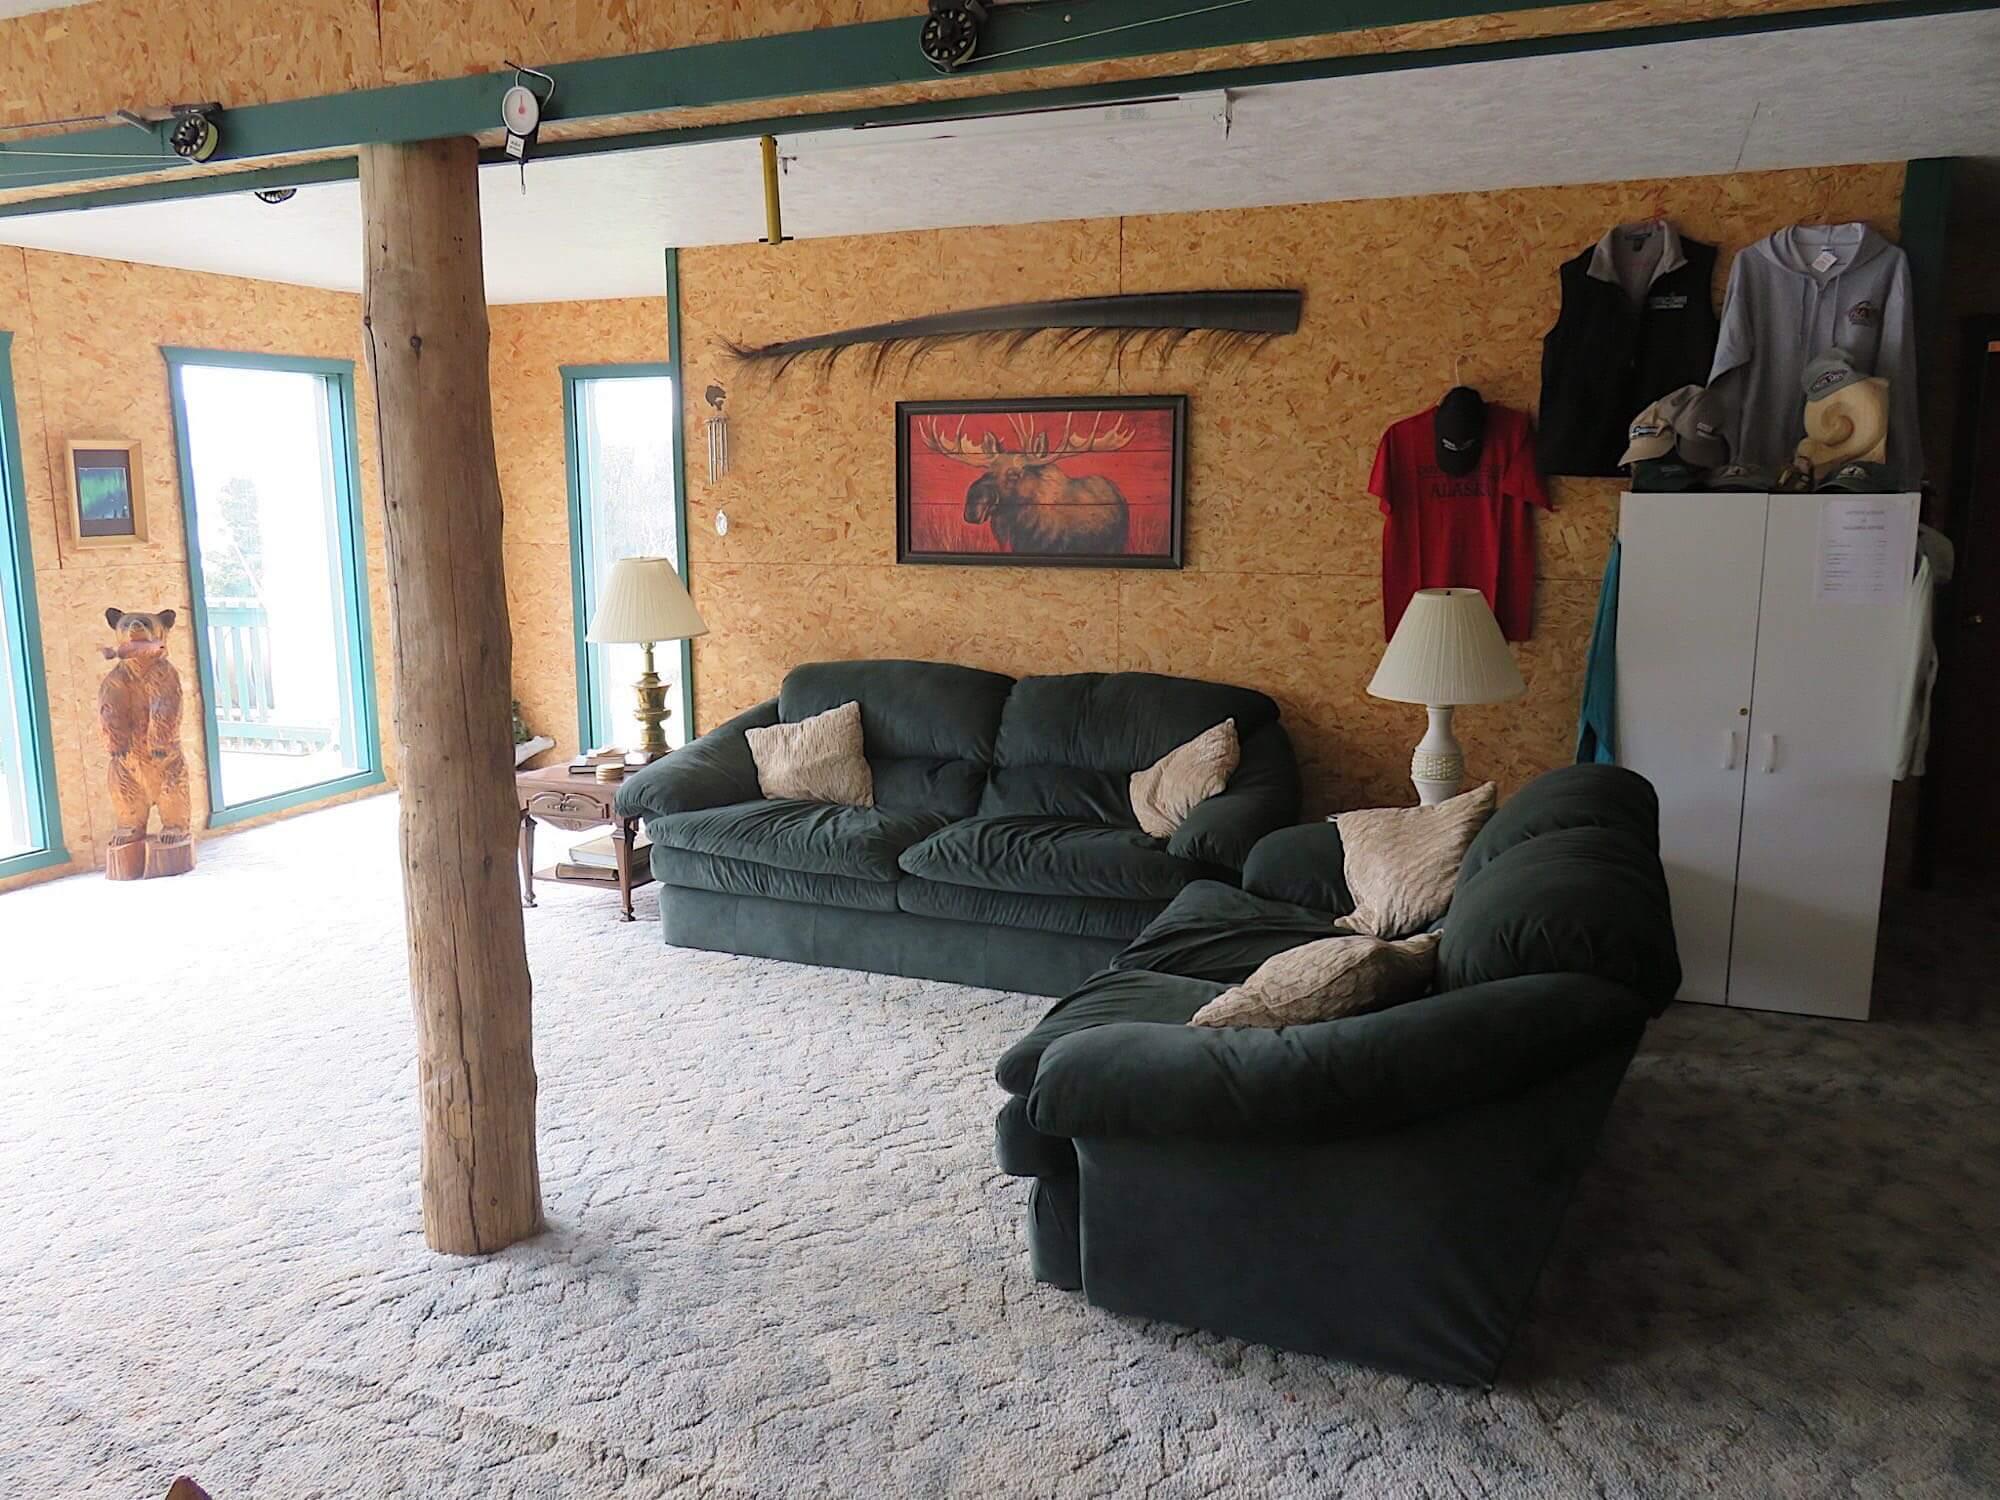 Bristol Bay fishing resort accomodations in Alaska